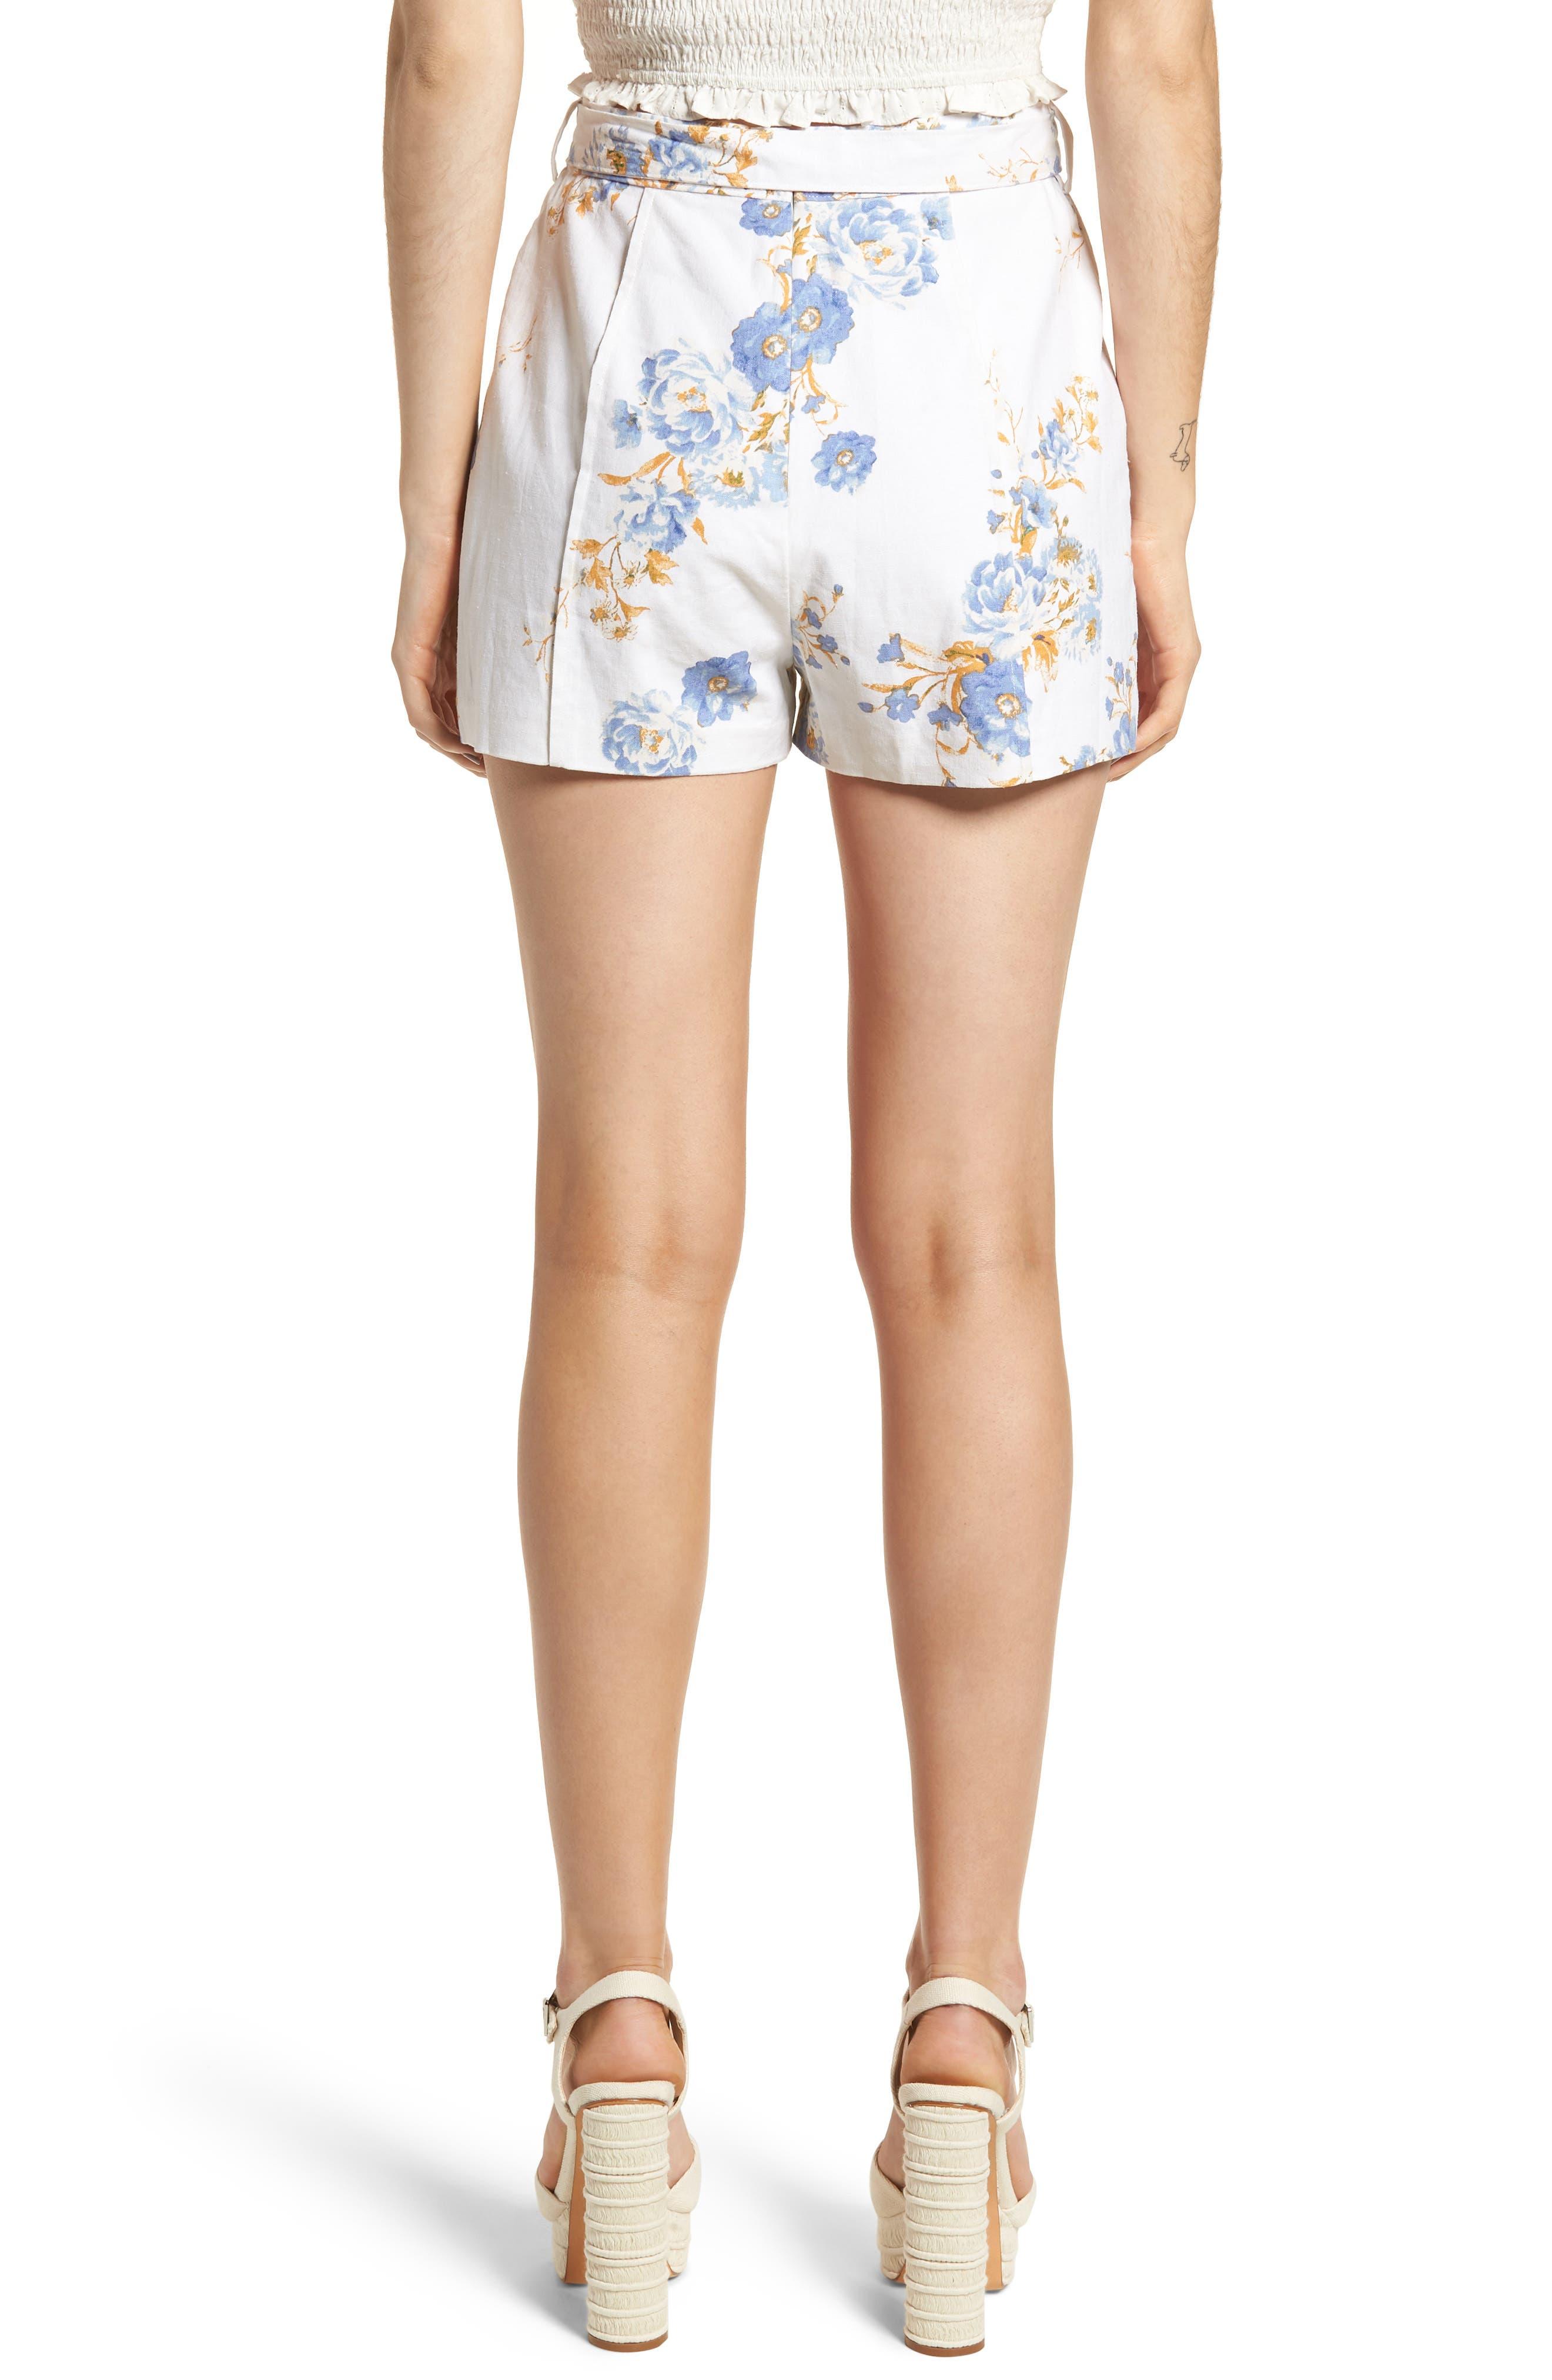 Matera High Waist Shorts,                             Alternate thumbnail 2, color,                             Ivory Floral